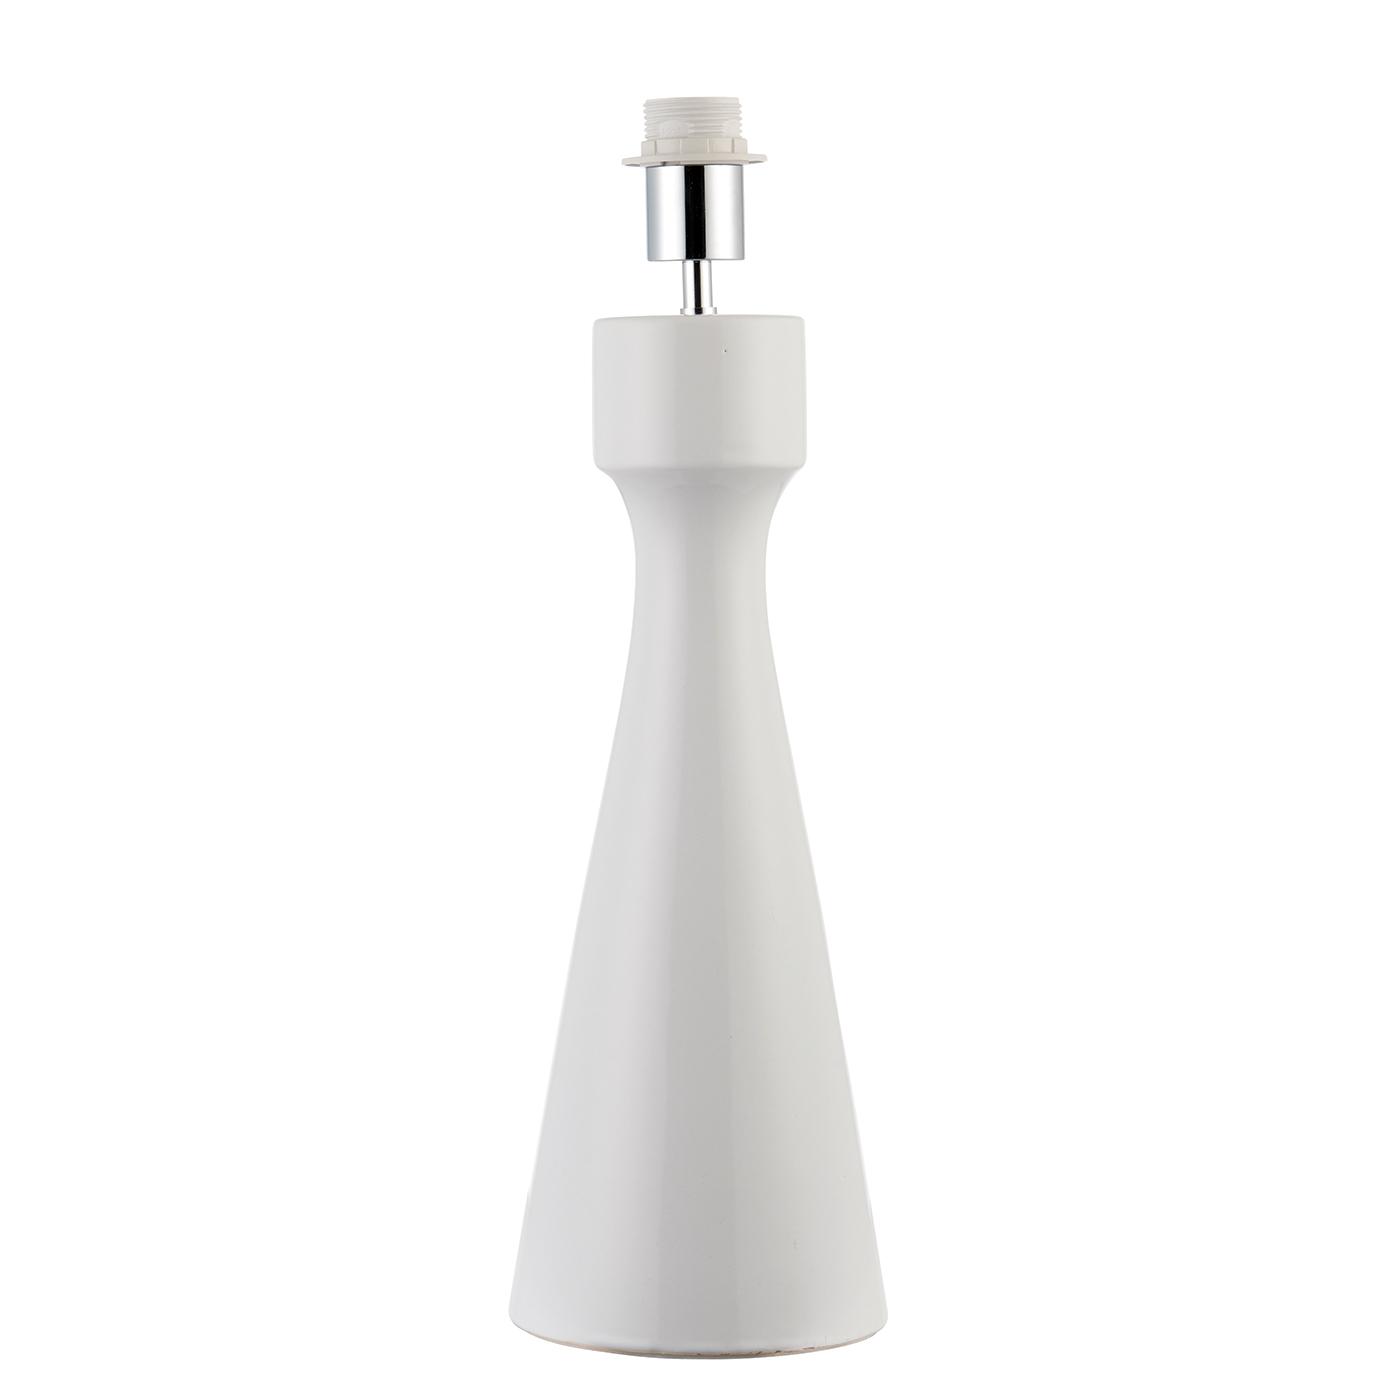 Endon 69915 Hapton Table Lamp 60W Whi